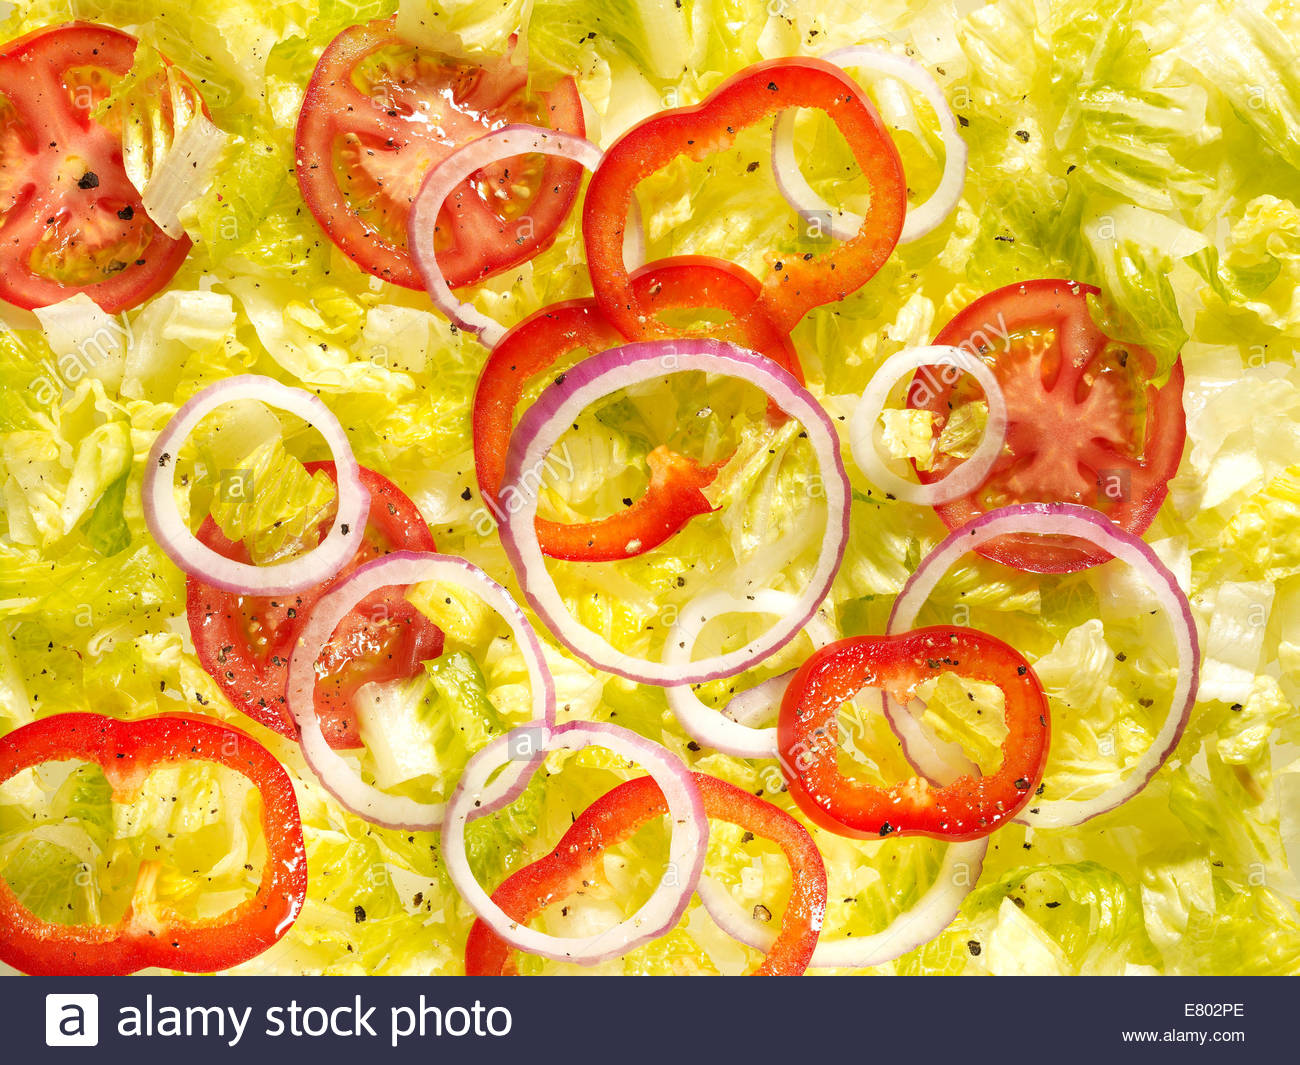 fresh vegetable salad of lettuce, tomato & onions - Stock Image